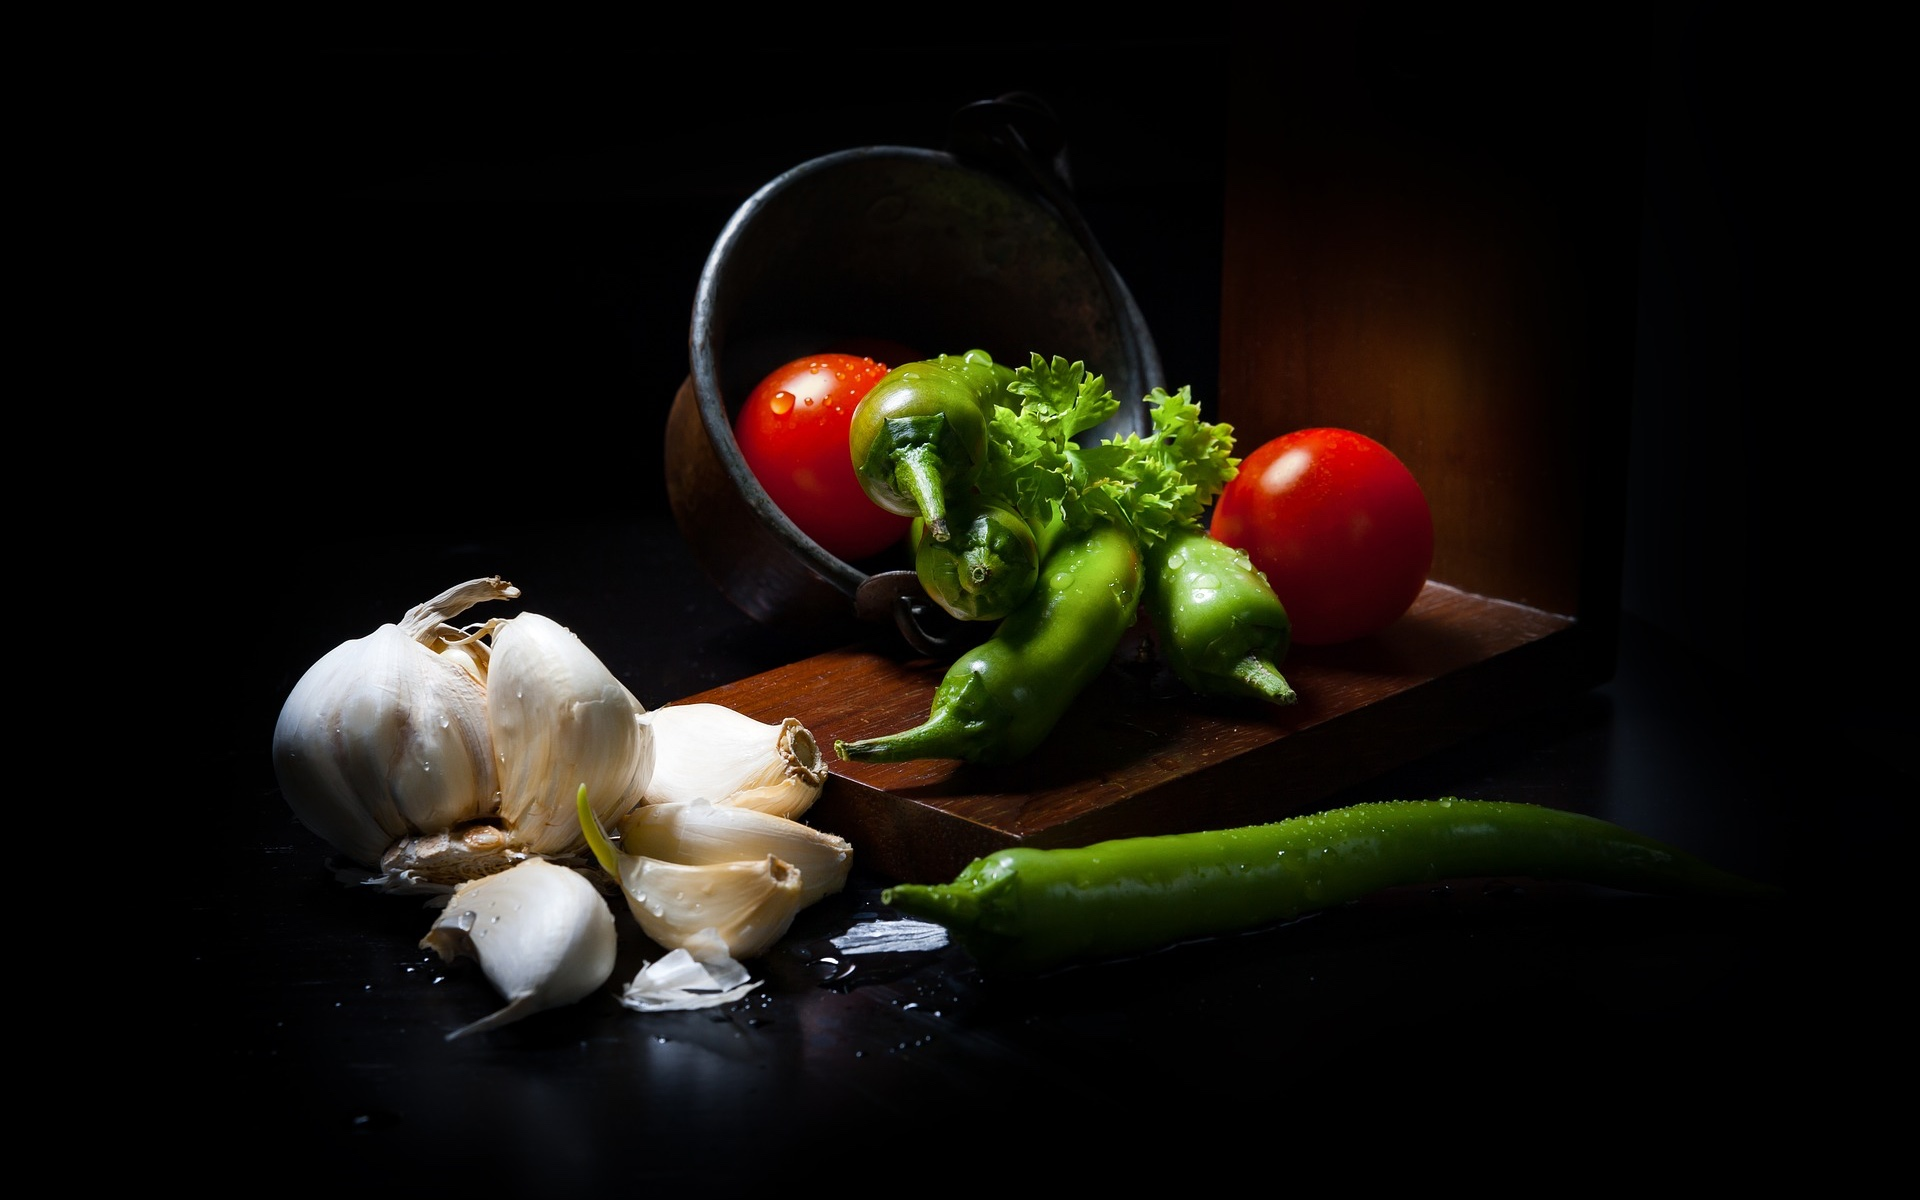 Gemüse Knoblauch Tomate PAprika pix 2983709